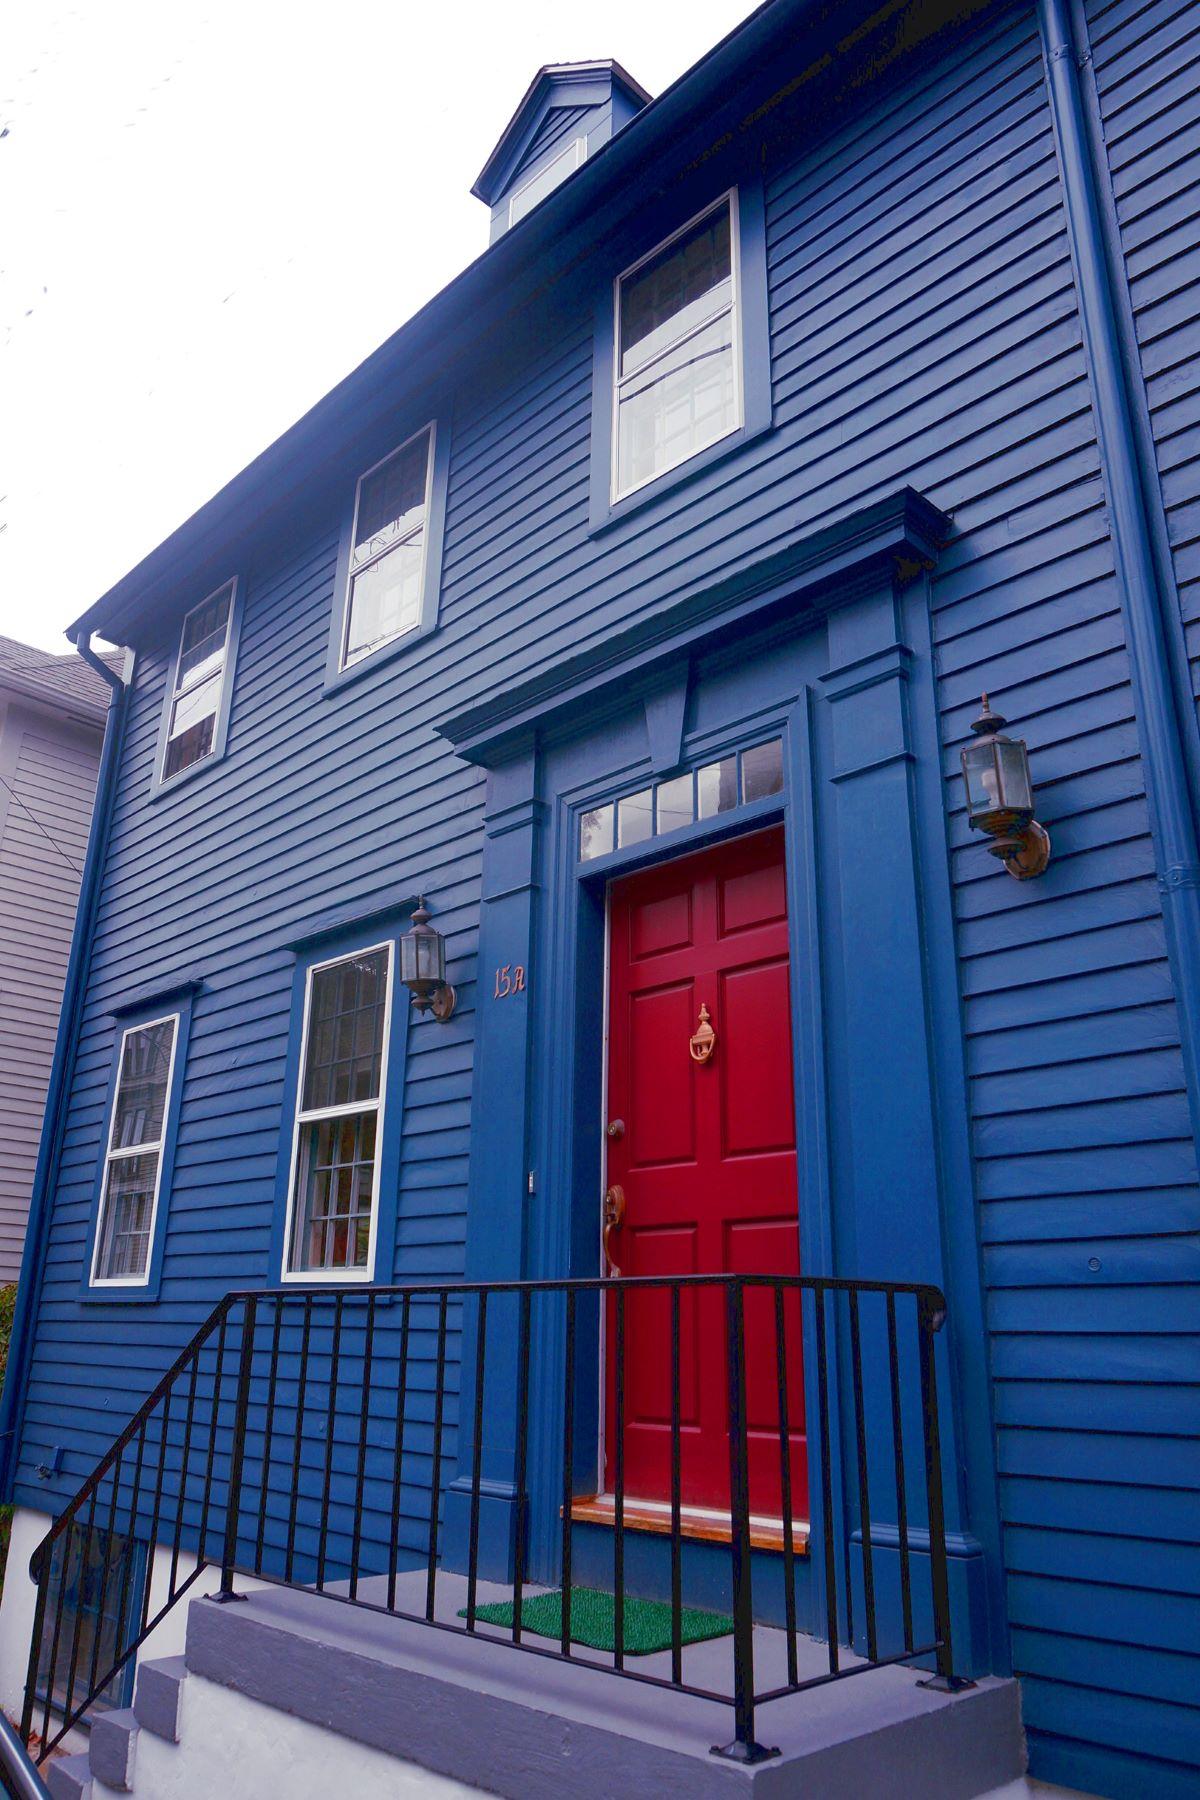 Additional photo for property listing at Historic Hill 15 A Corne Street 纽波特, 罗得岛 02840 美国